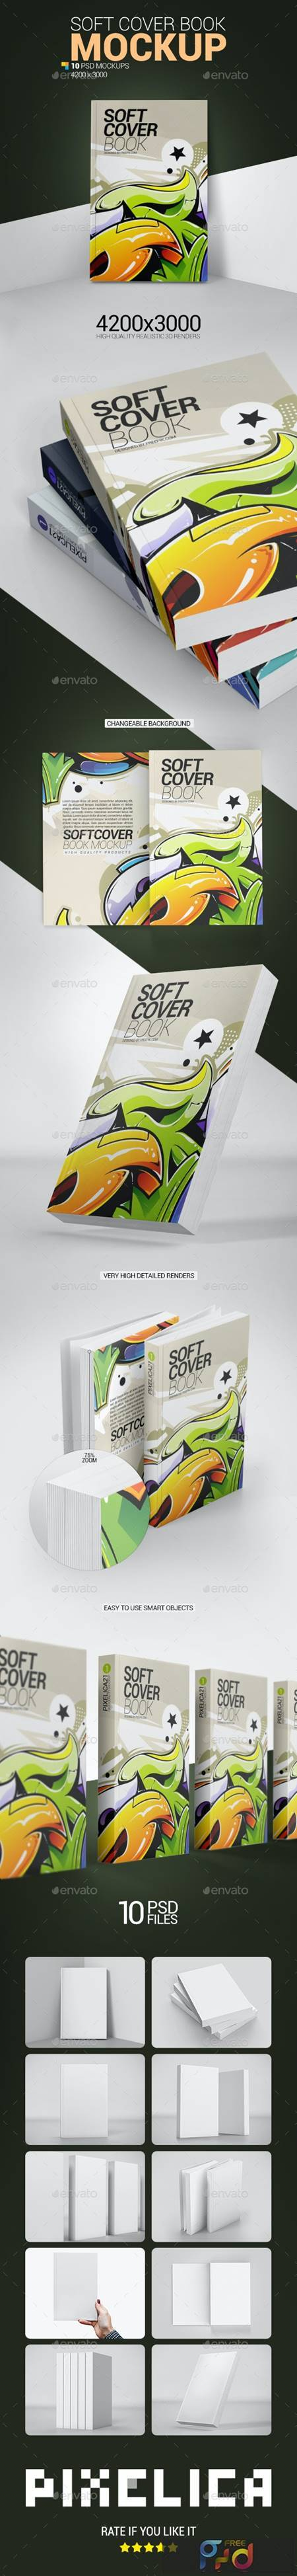 Soft Cover Book Mockup 25221896 1